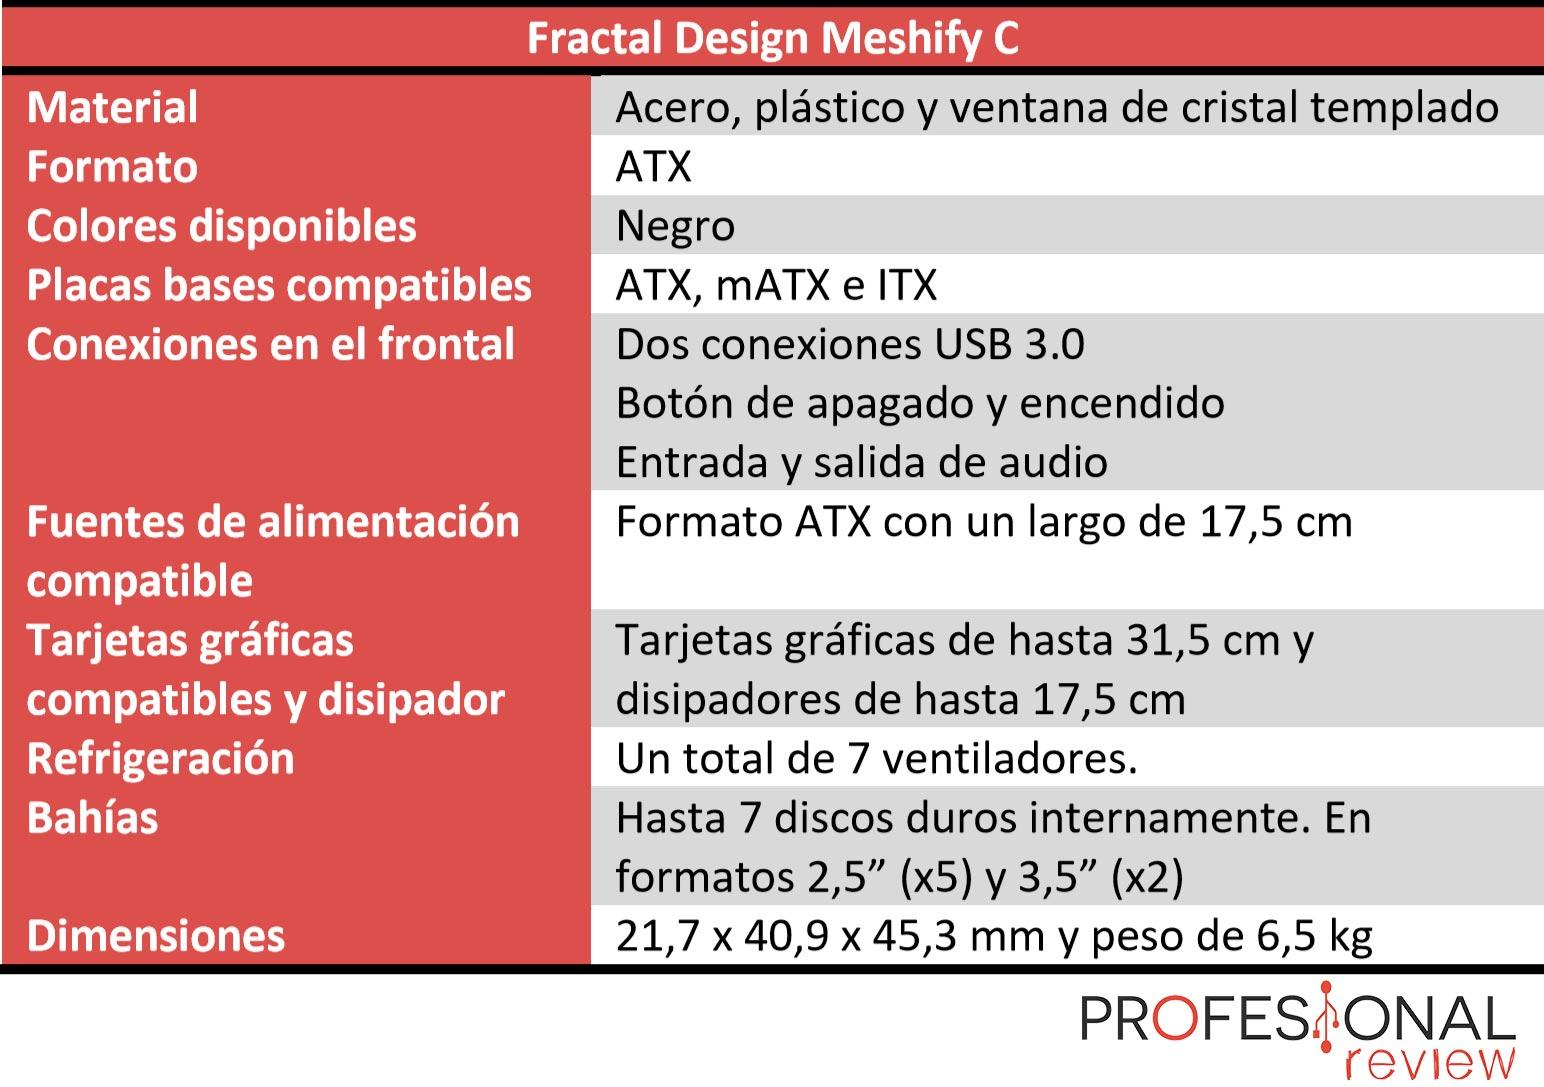 Fractal Design Meshify C caracteristicas